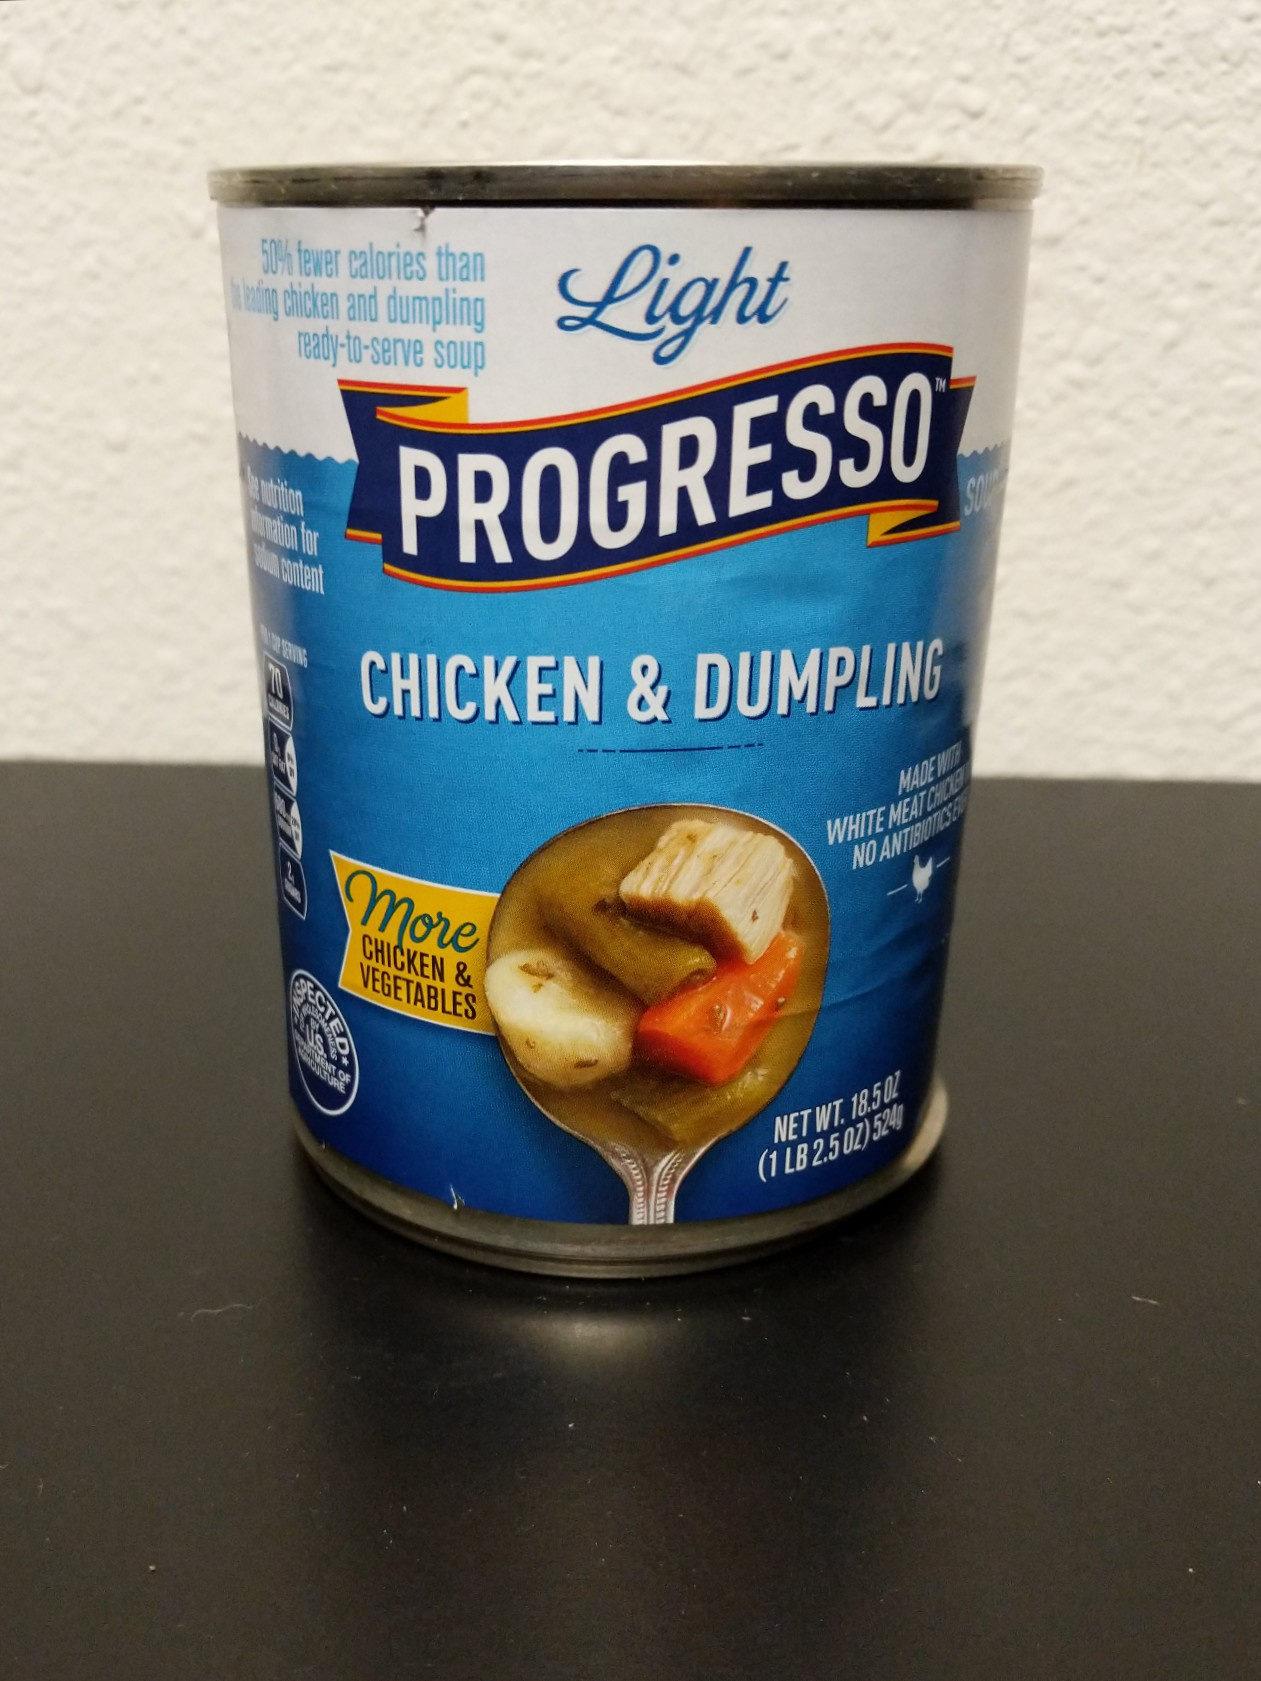 Chicken & Dumpling - Product